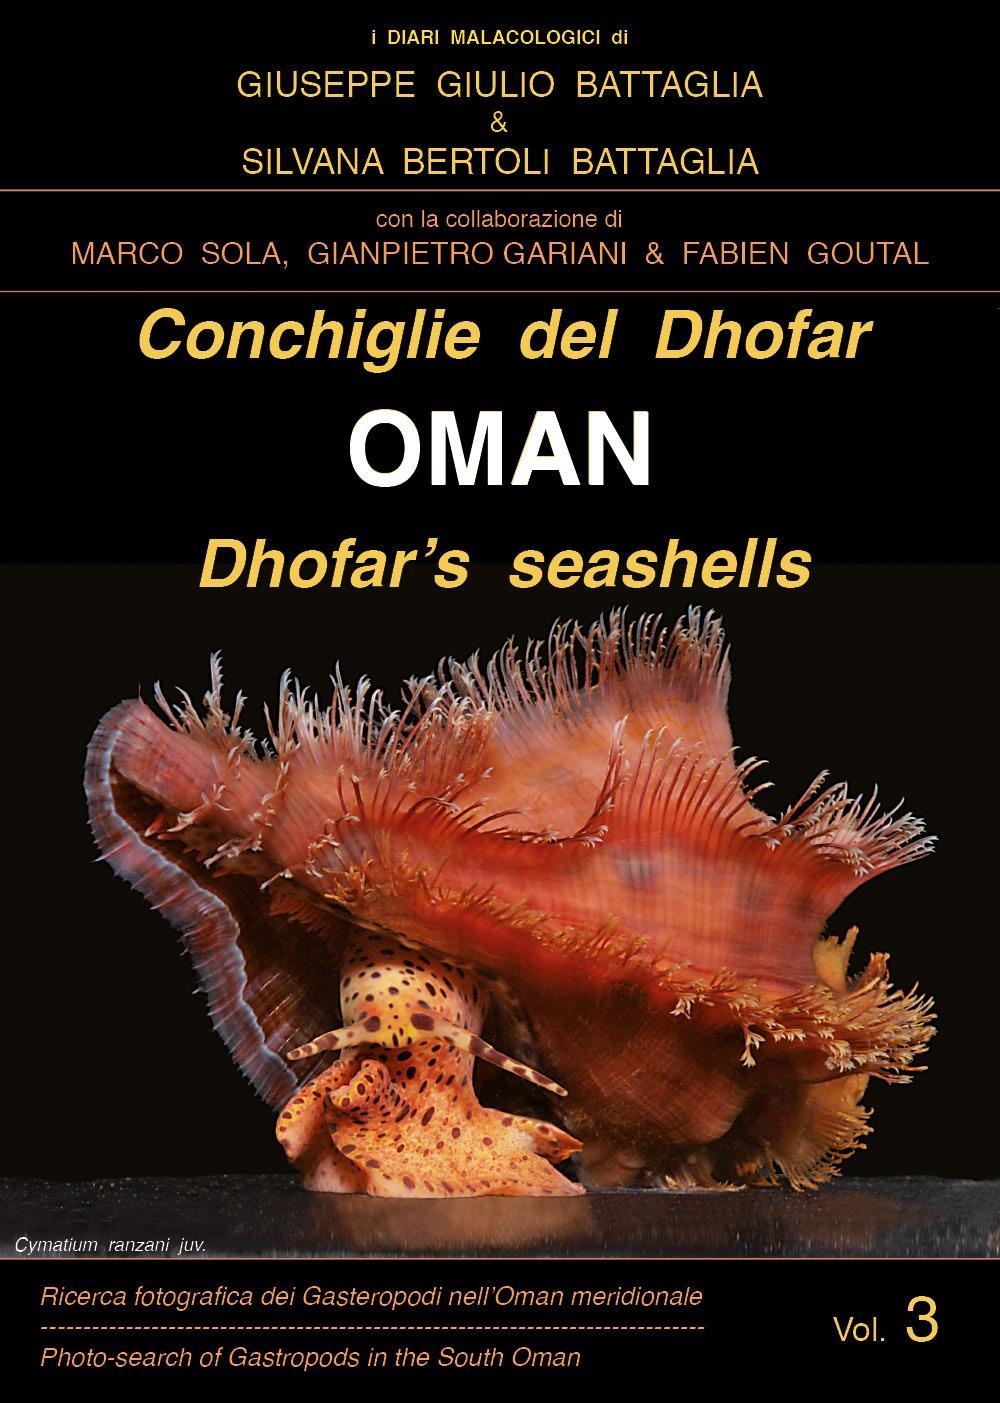 Conchiglie del Dhofar - OMAN - Dhofar's seashells